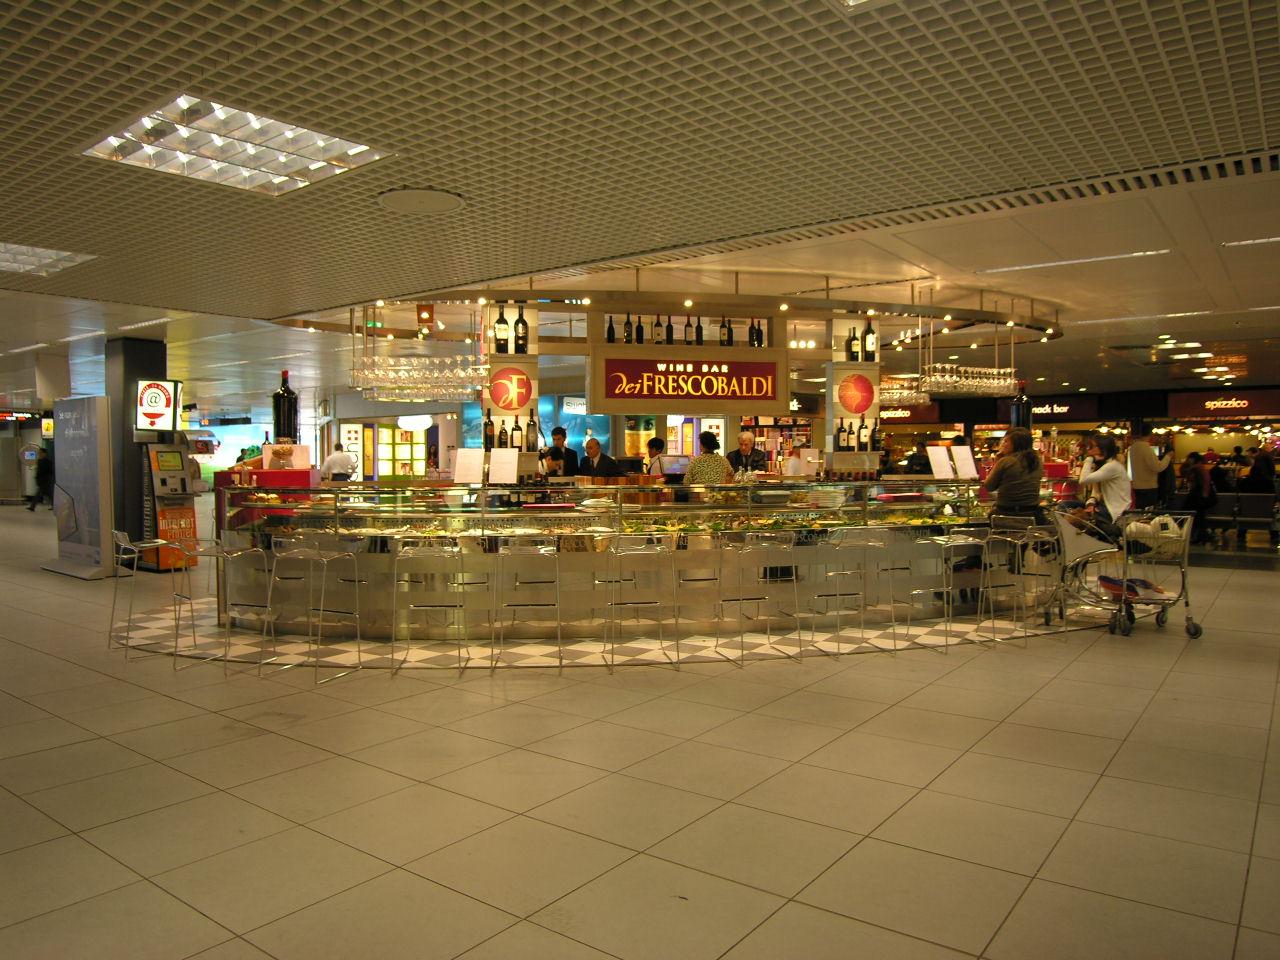 Piemme arredamenti for Distribuzione italiana arredamenti